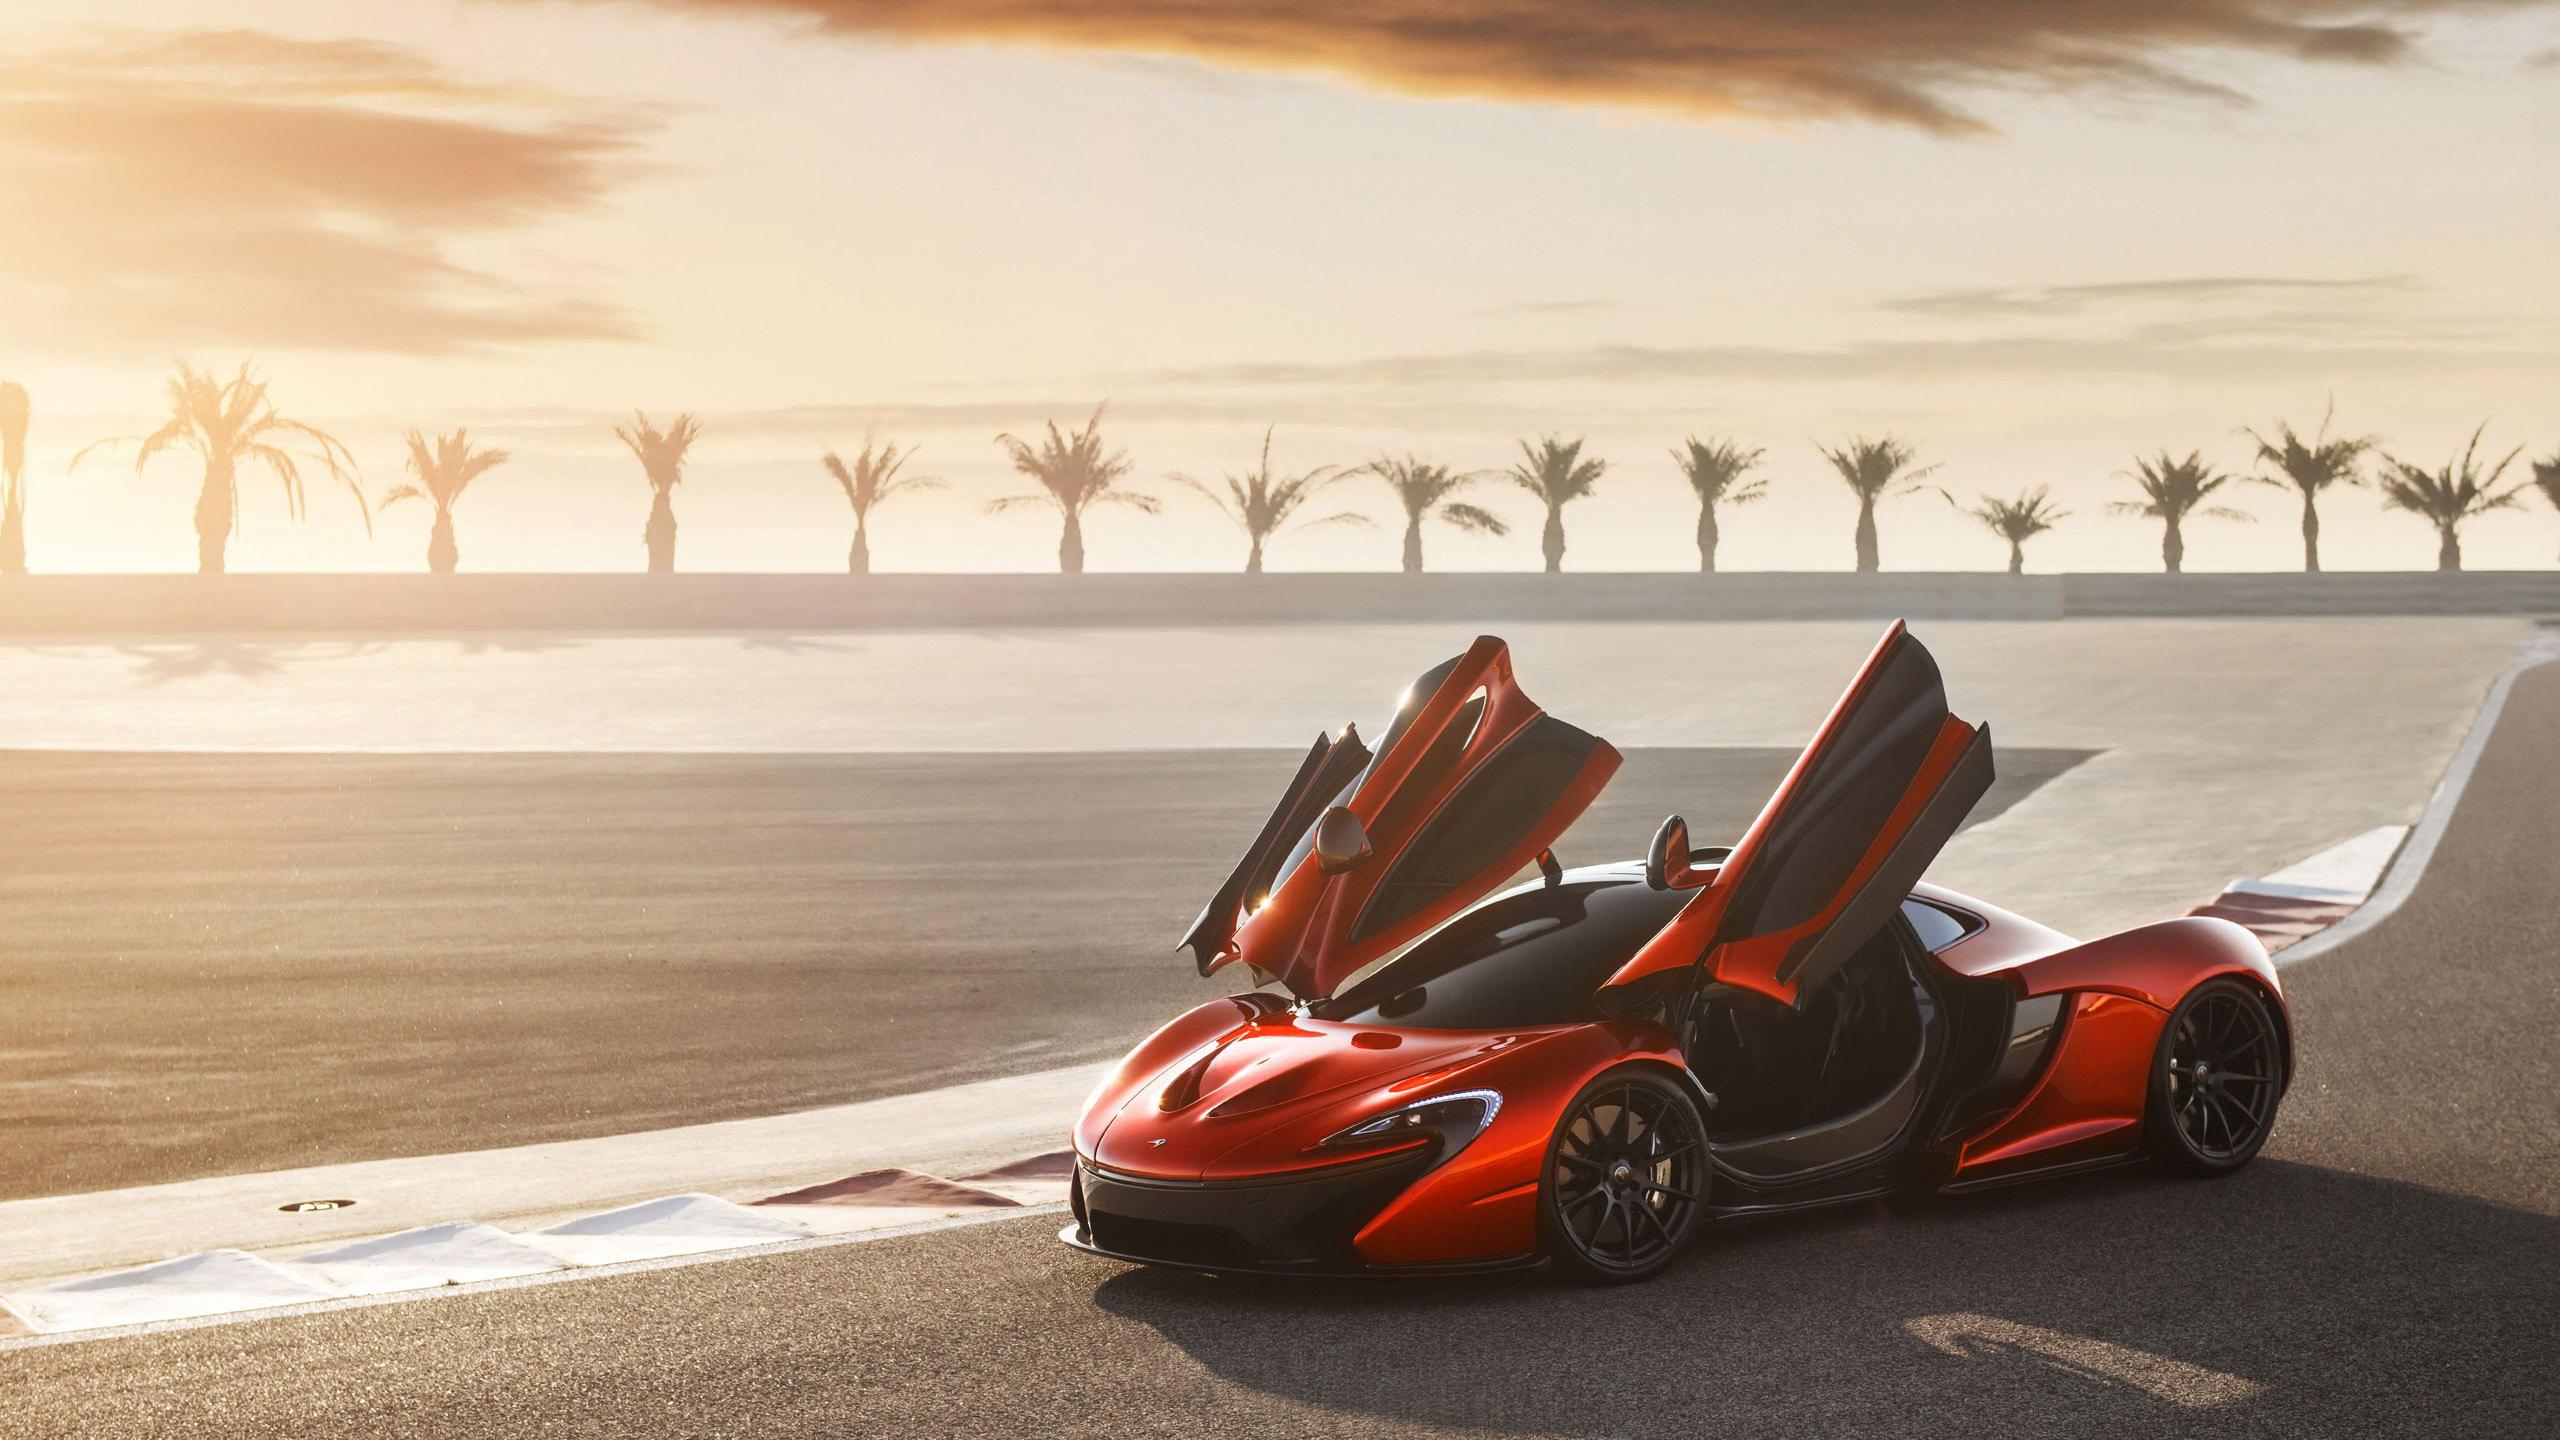 mclaren p1 supercar hd, hd cars, 4k wallpapers, images, backgrounds